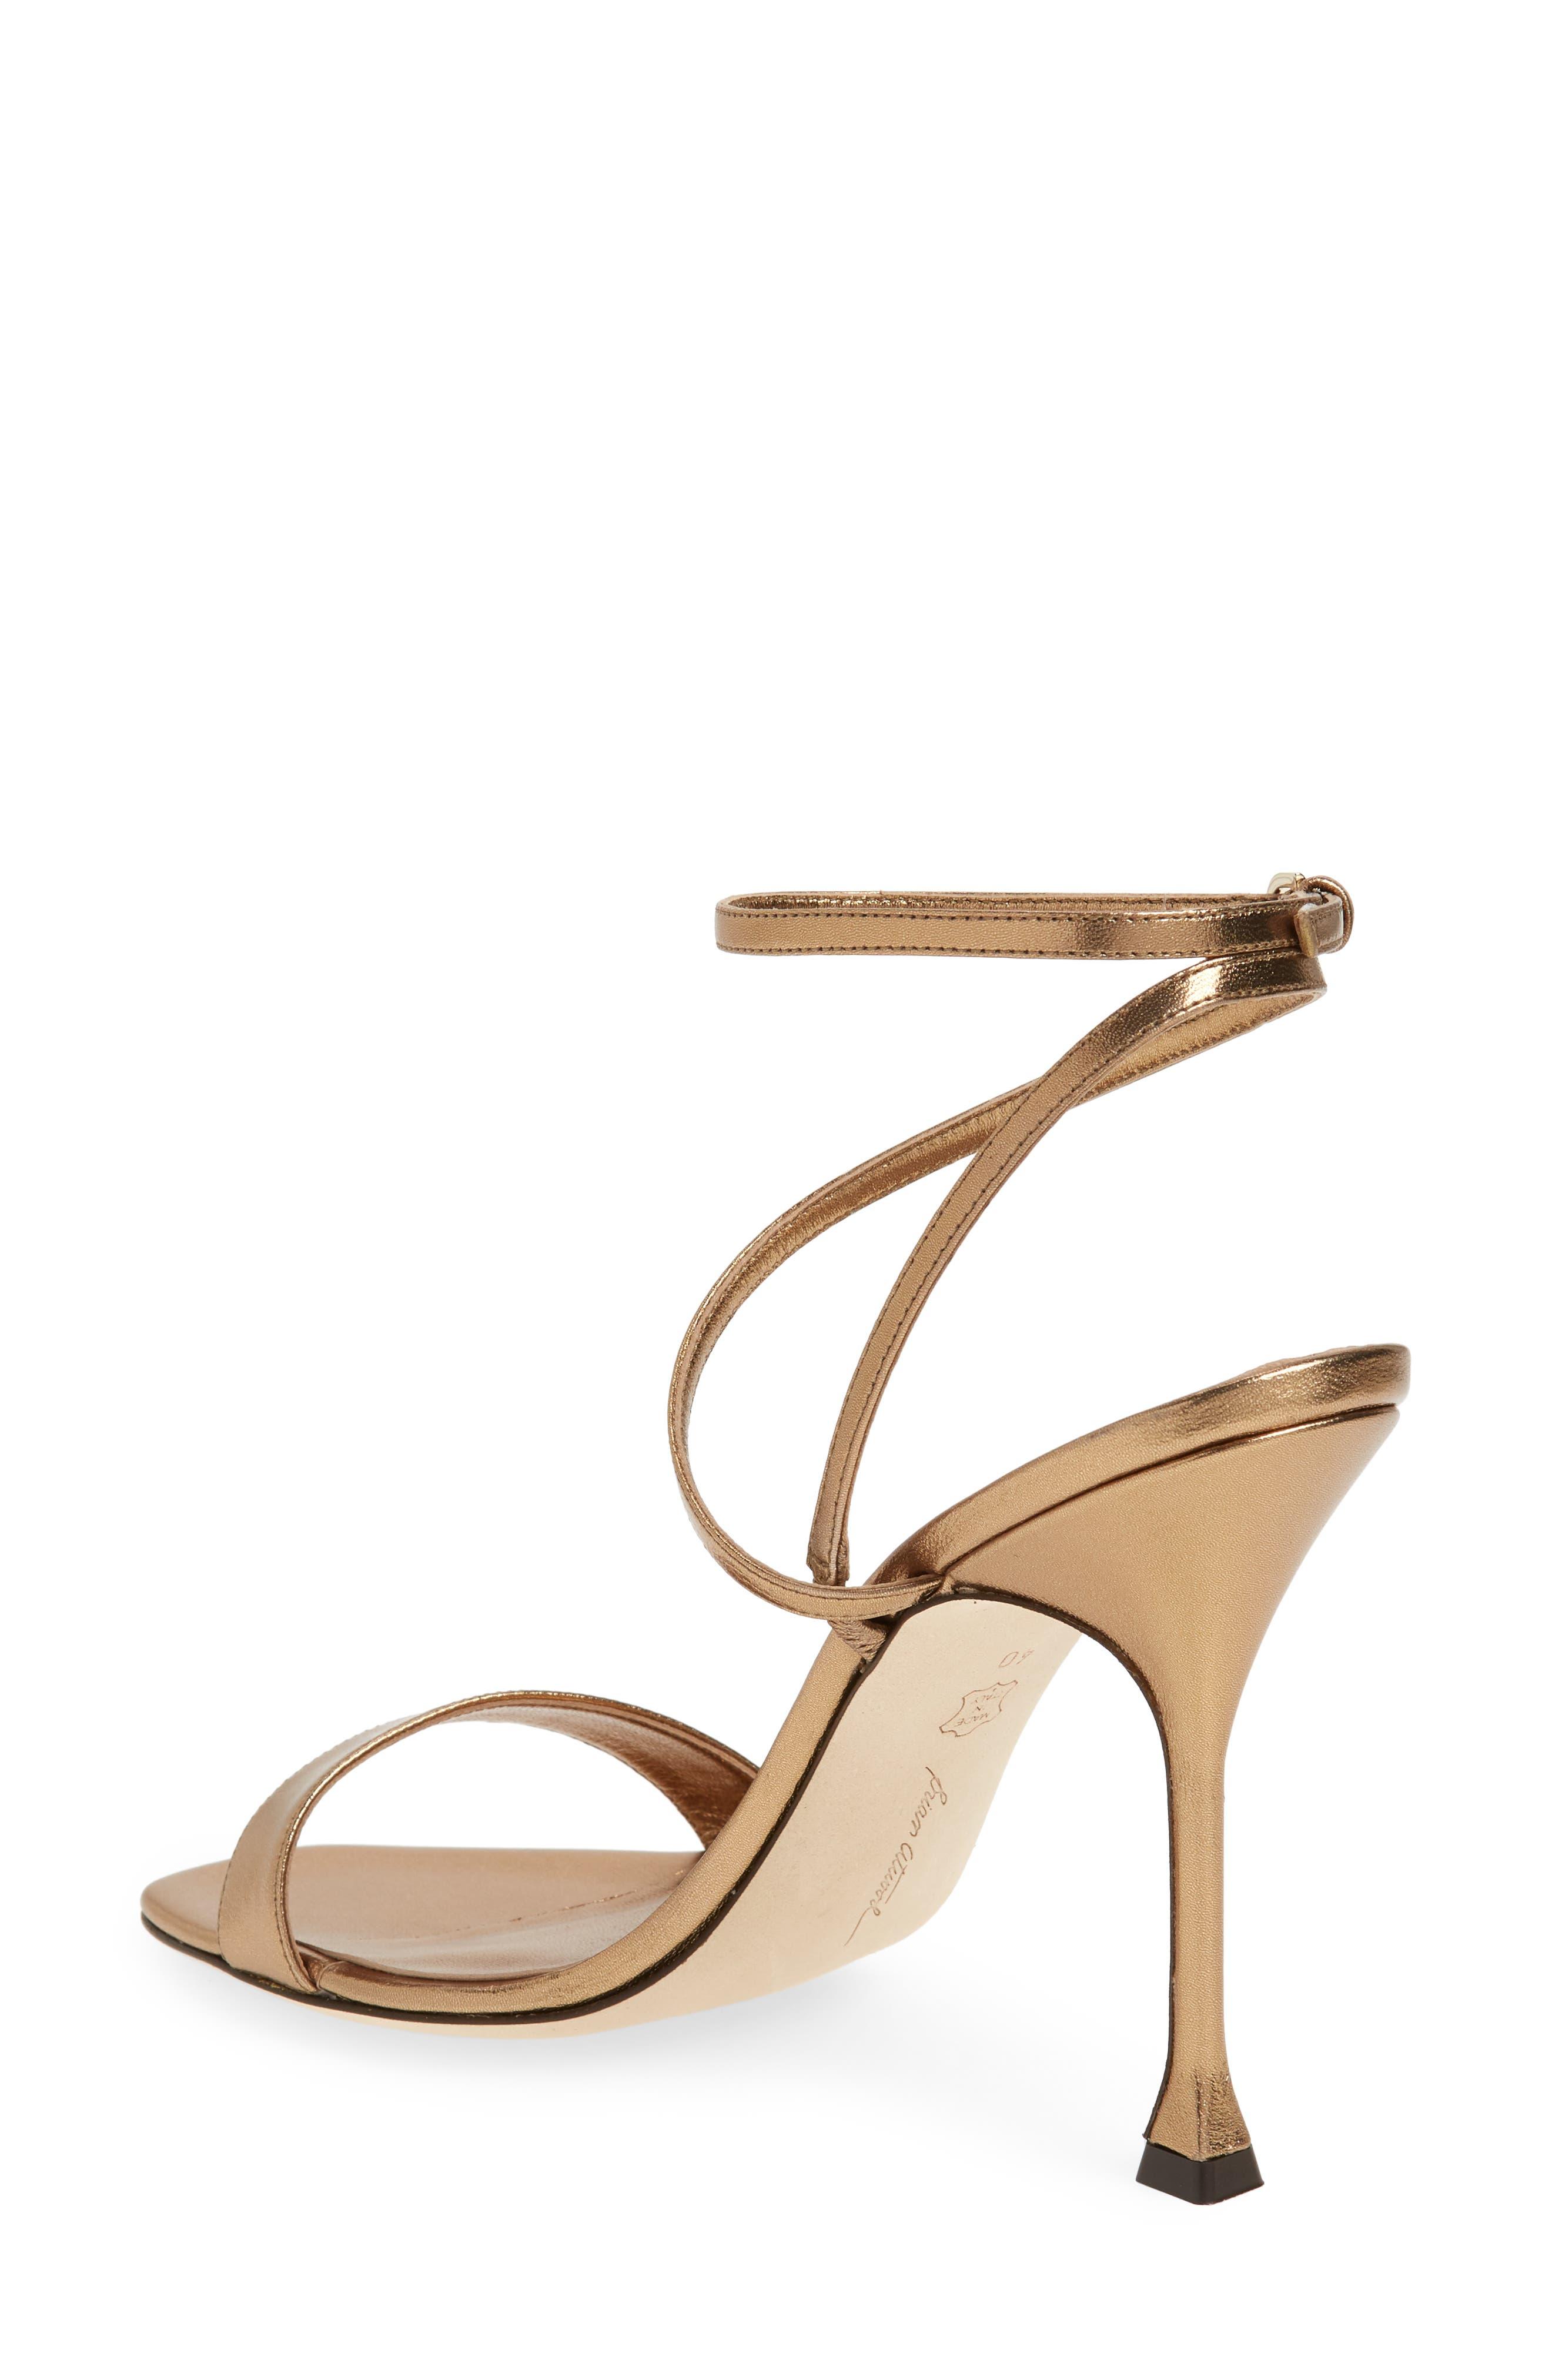 Sienna Ankle Strap Sandal,                             Alternate thumbnail 2, color,                             Bronze Metal Nappa